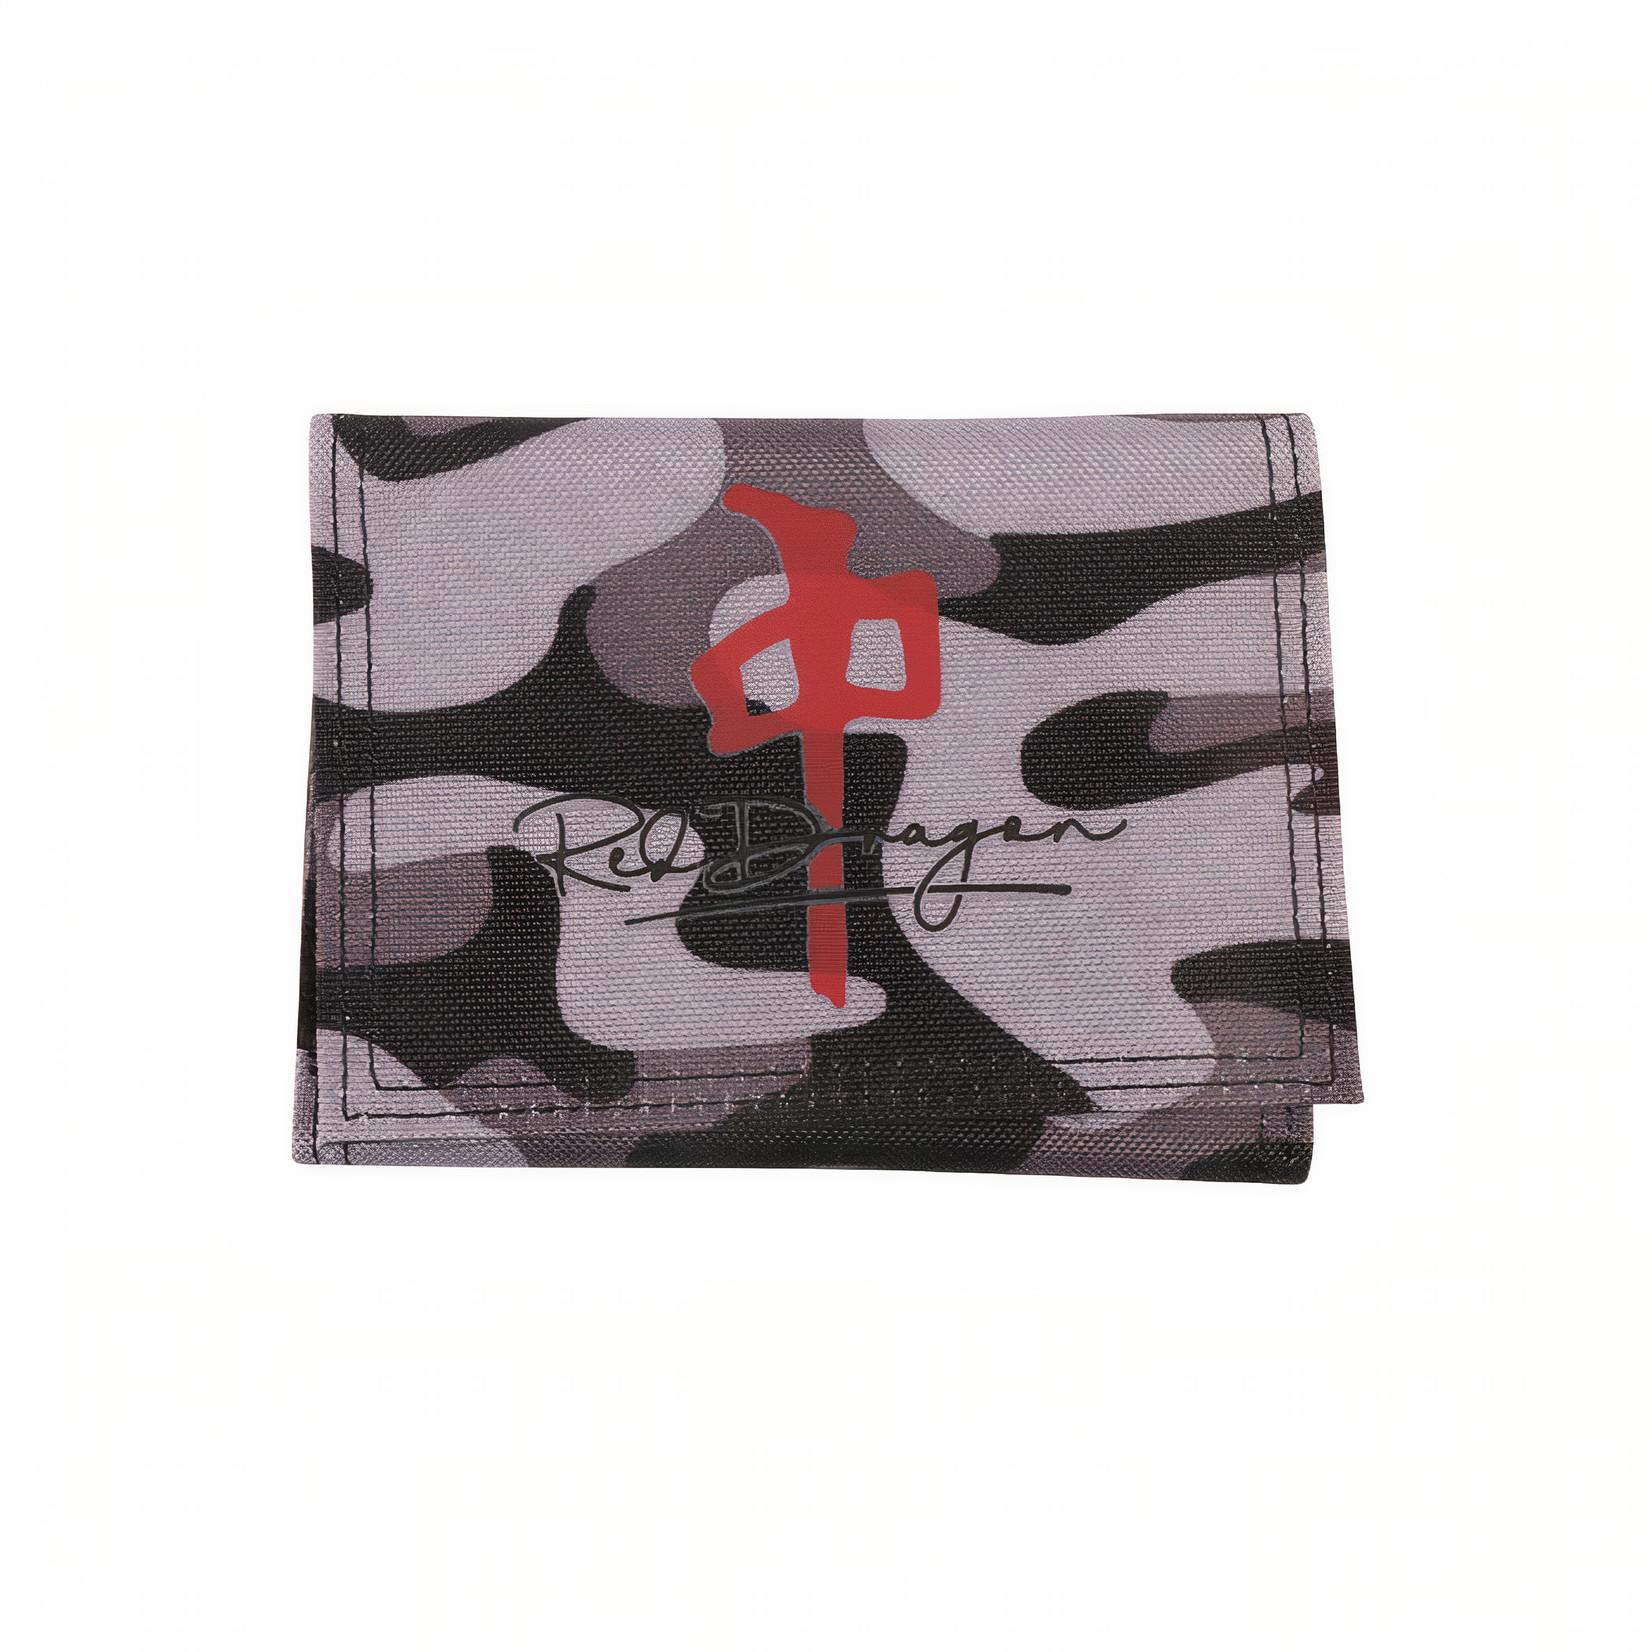 Red Dragon Apparel RDS - Signature Velcro Wallet - Black Camo